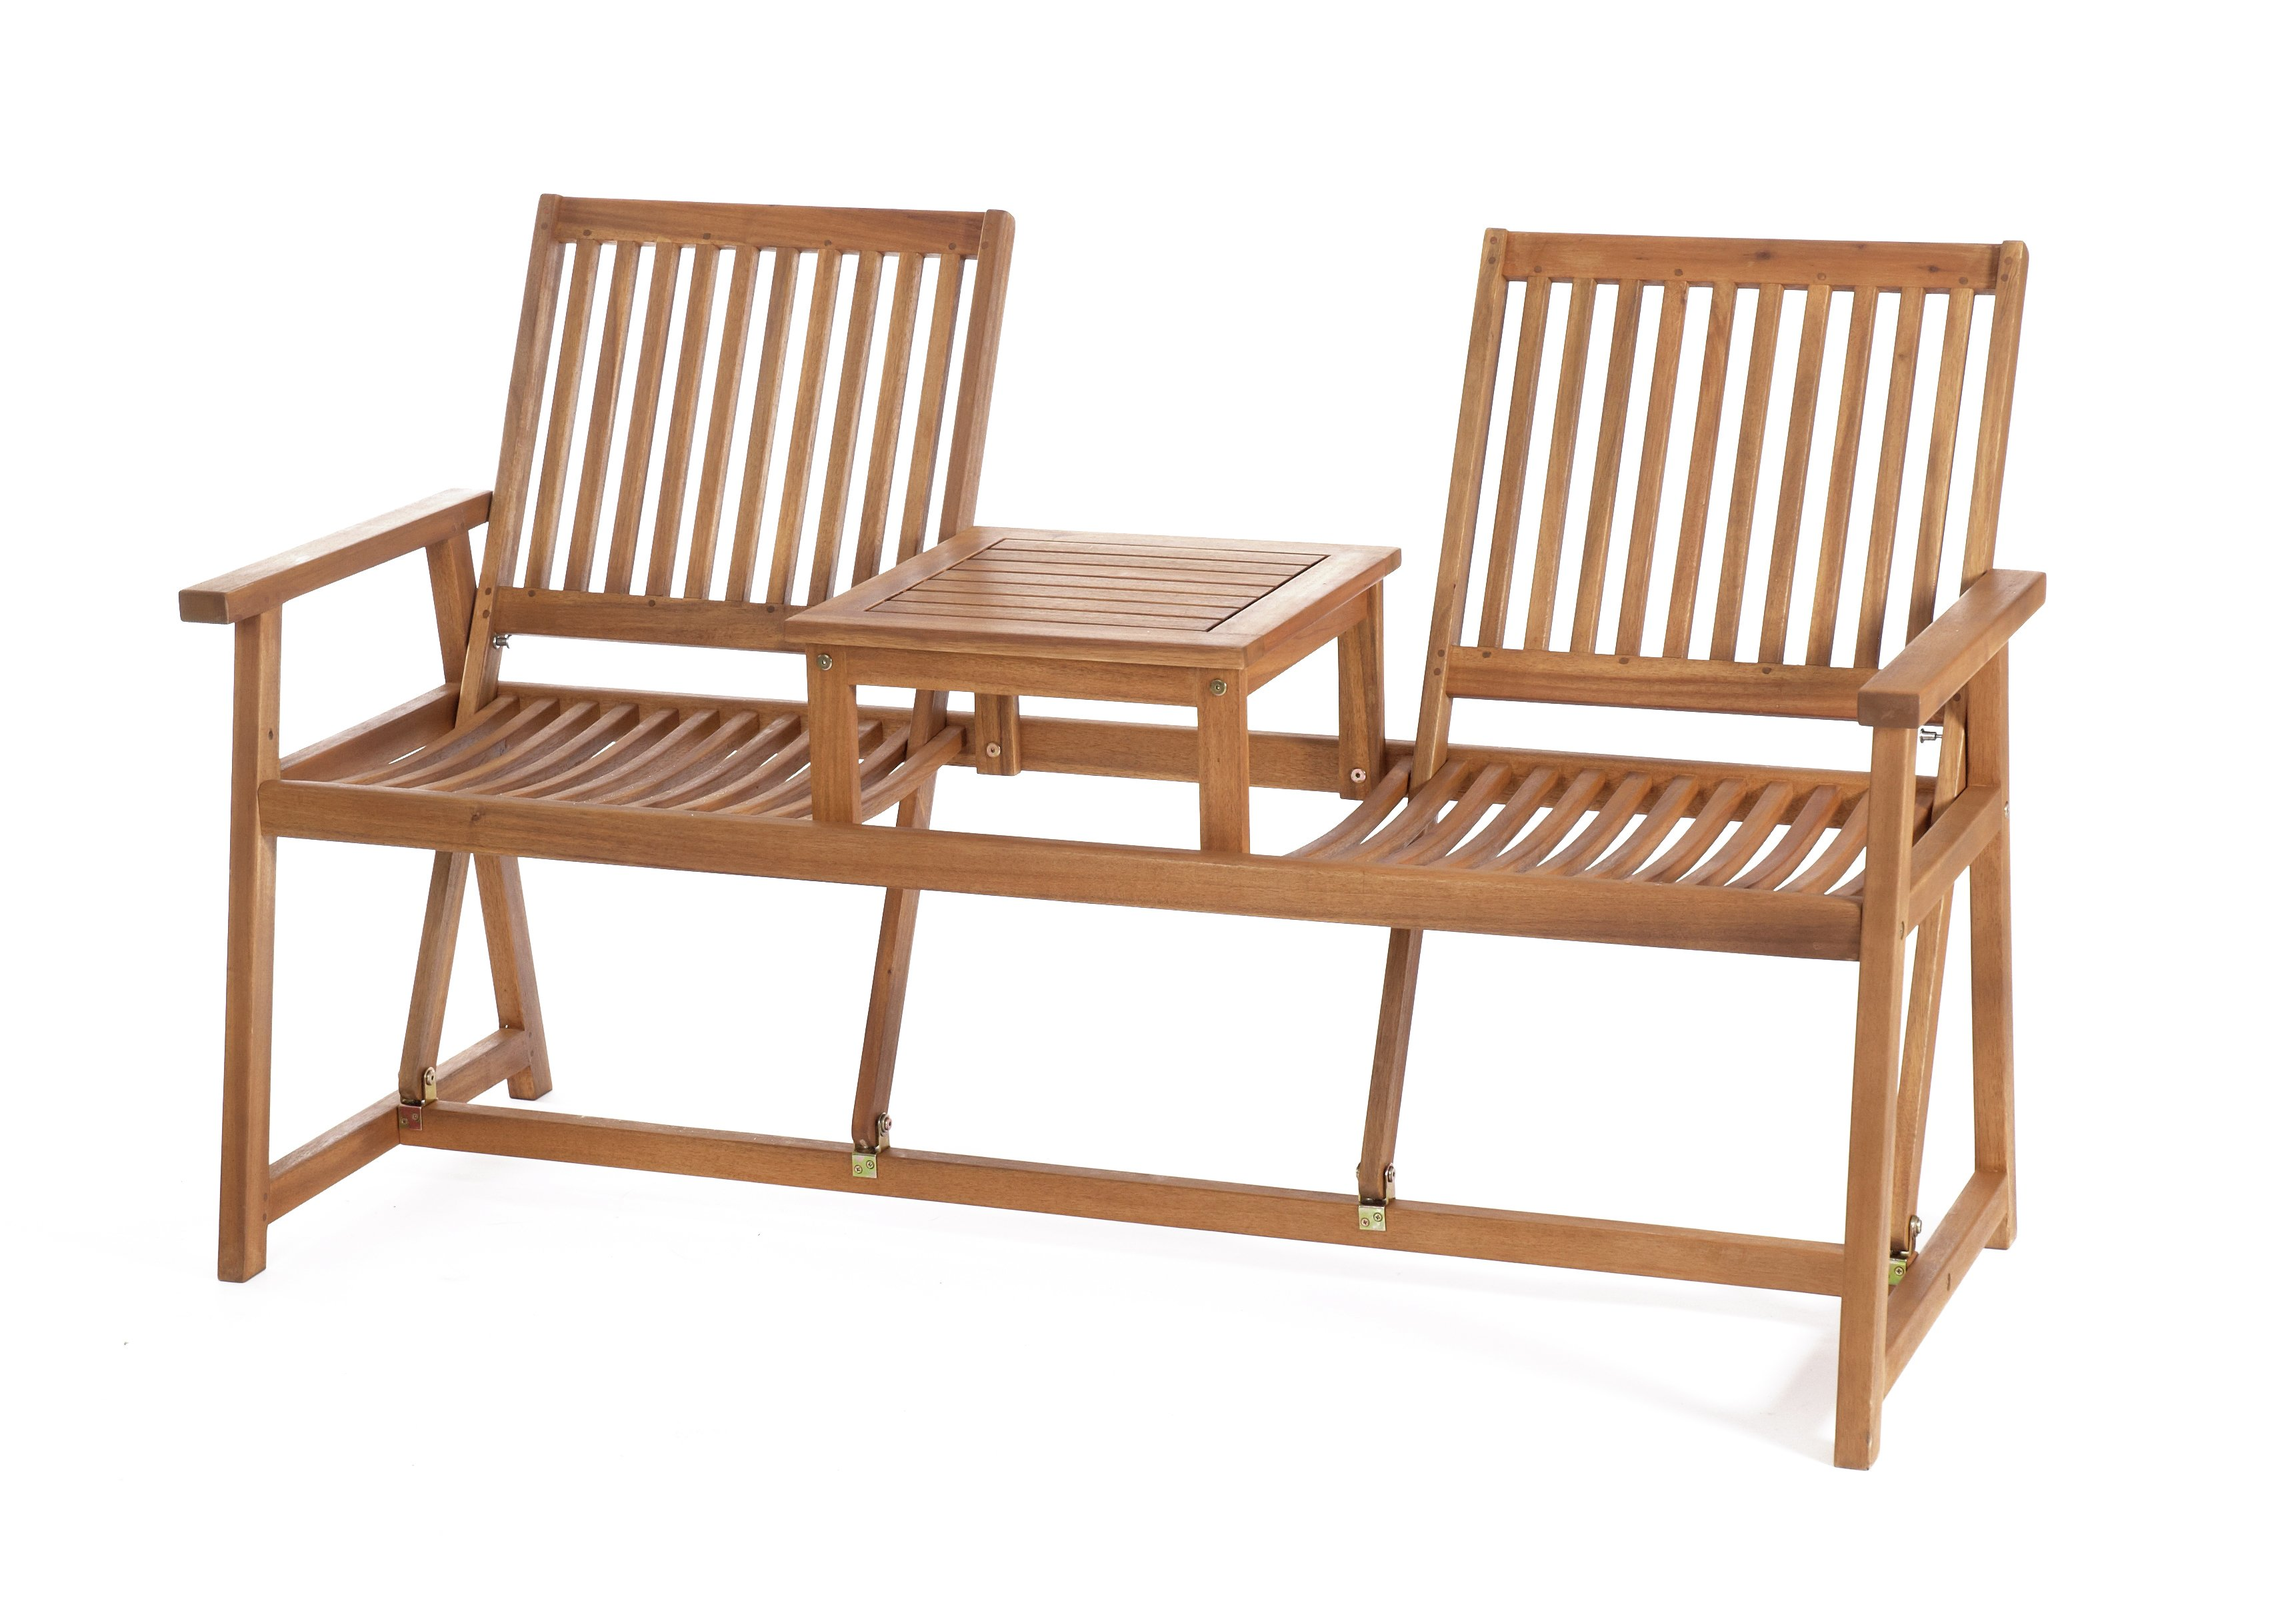 Greenhurst Switchable Backrest Companion Bench lowest price